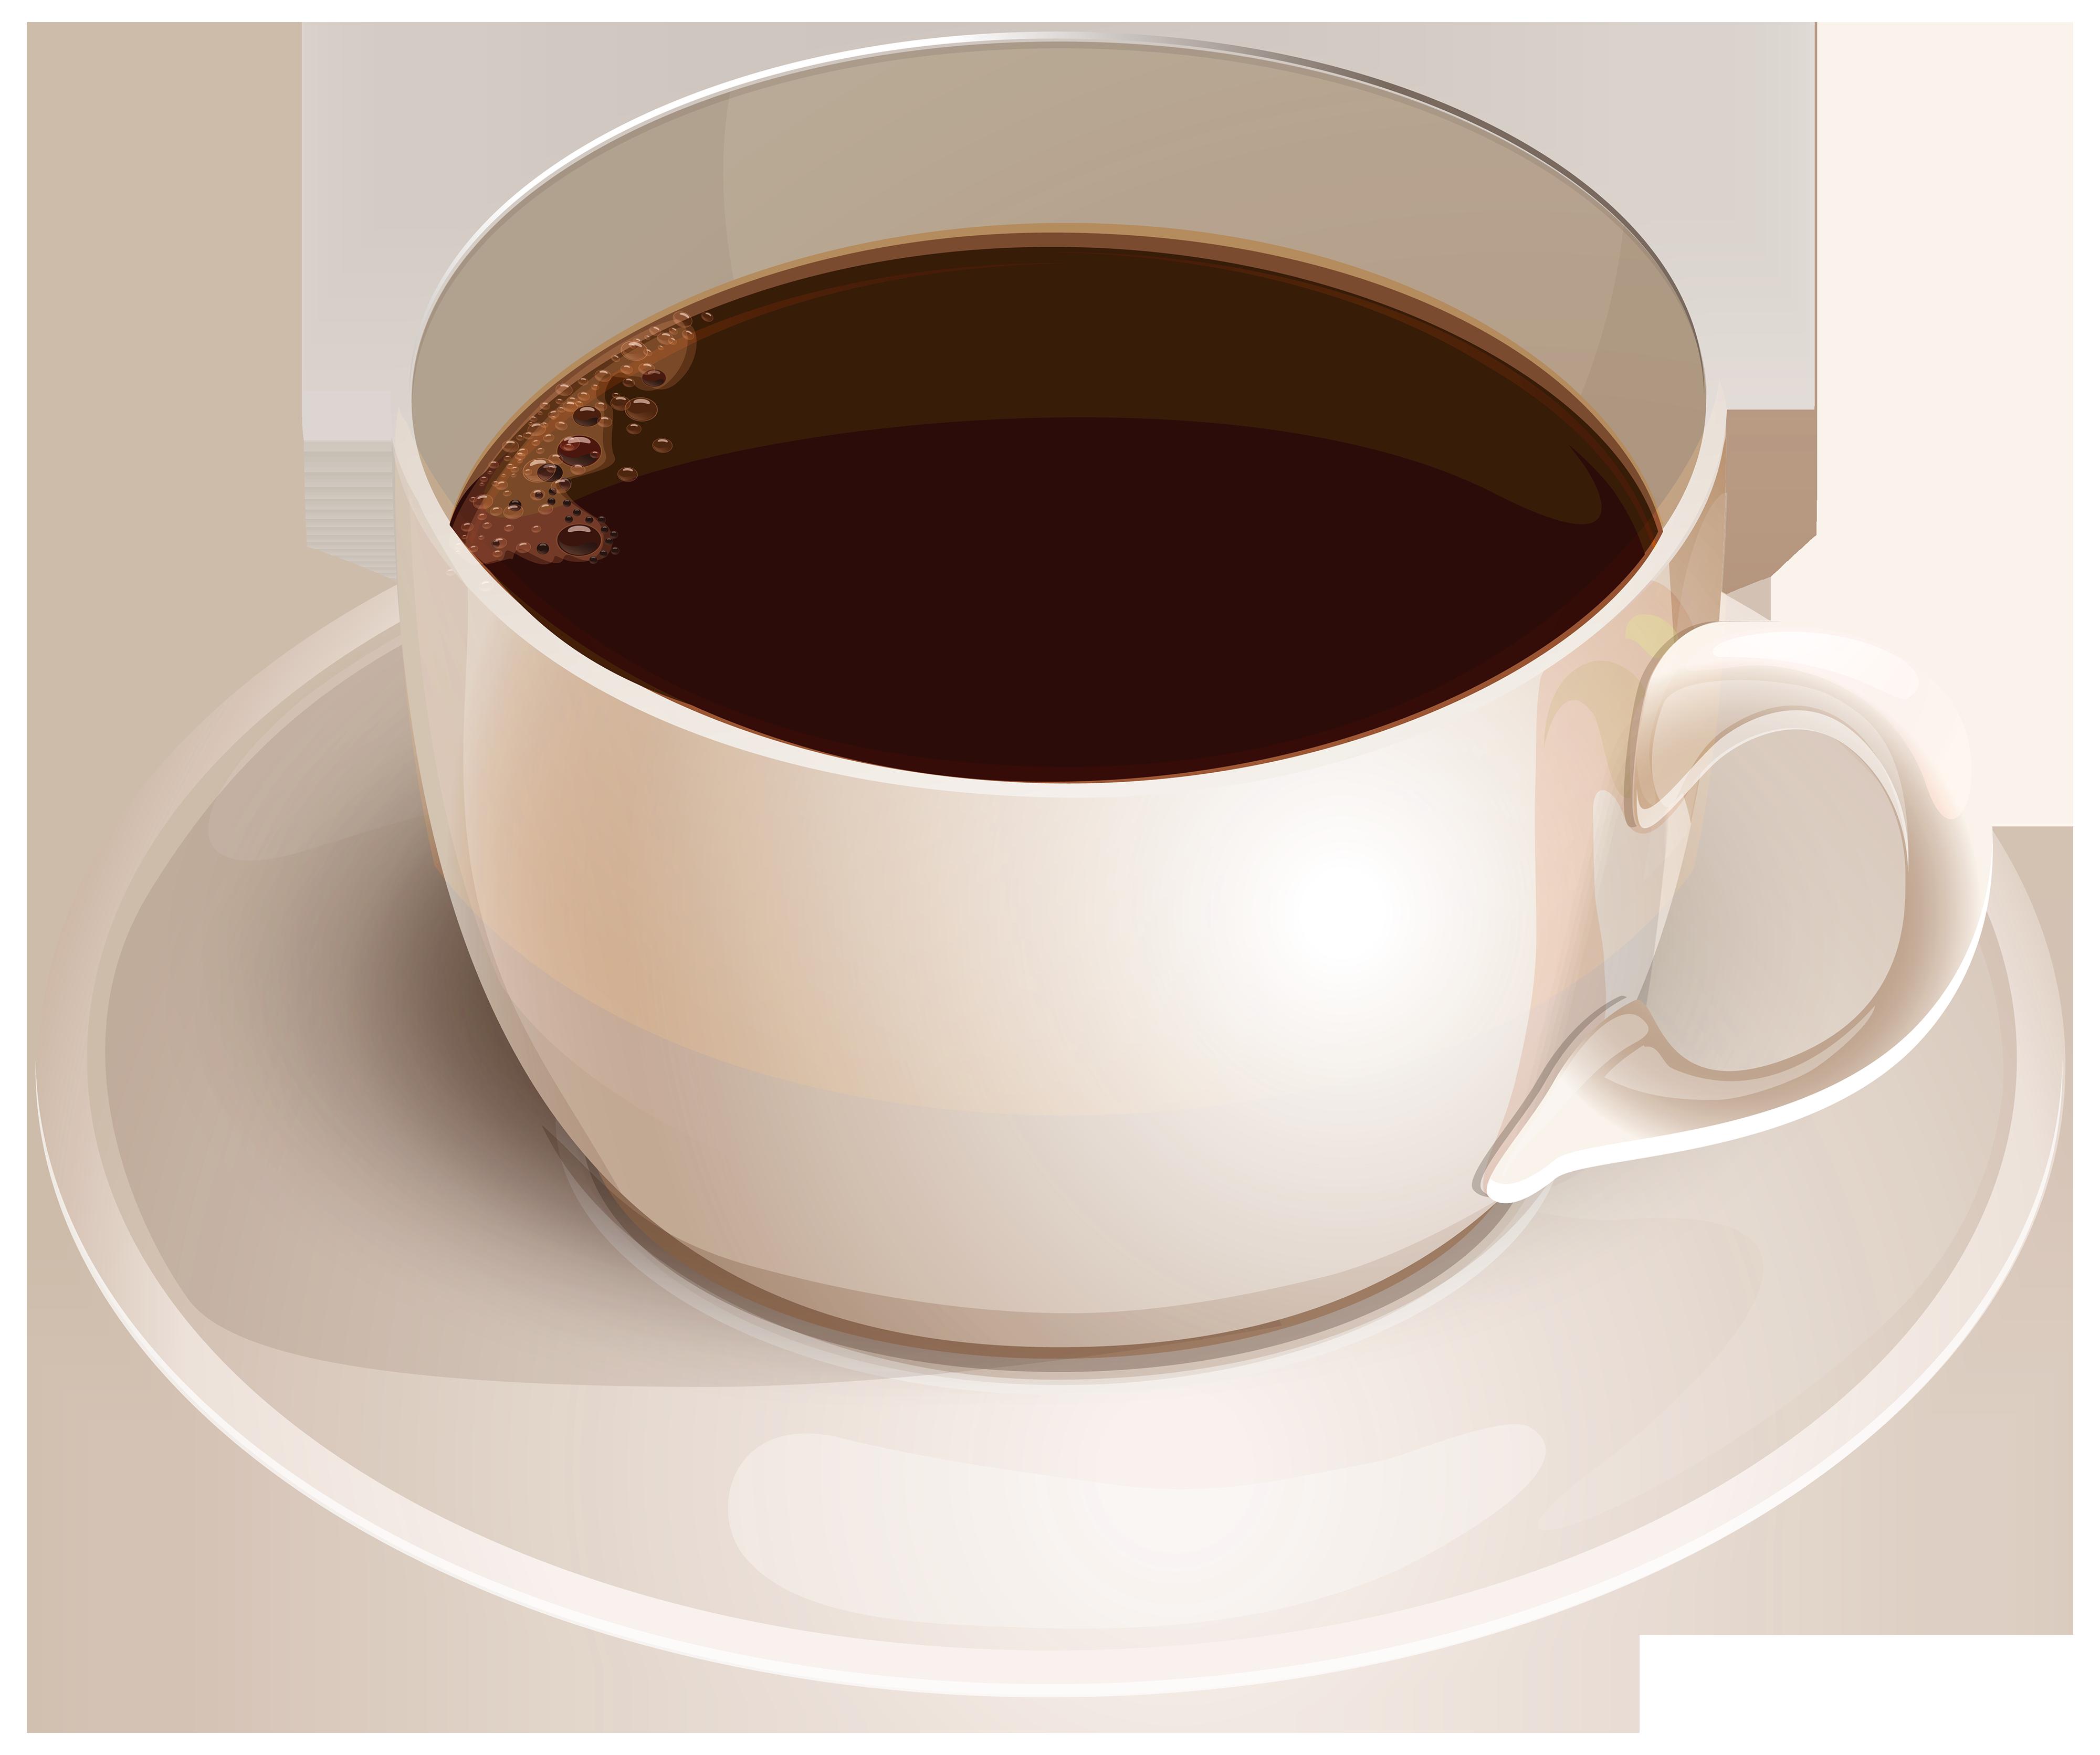 Cup Mug Coffee Png Image Good Morning Coffee Cup Good Morning Coffee Coffee Png